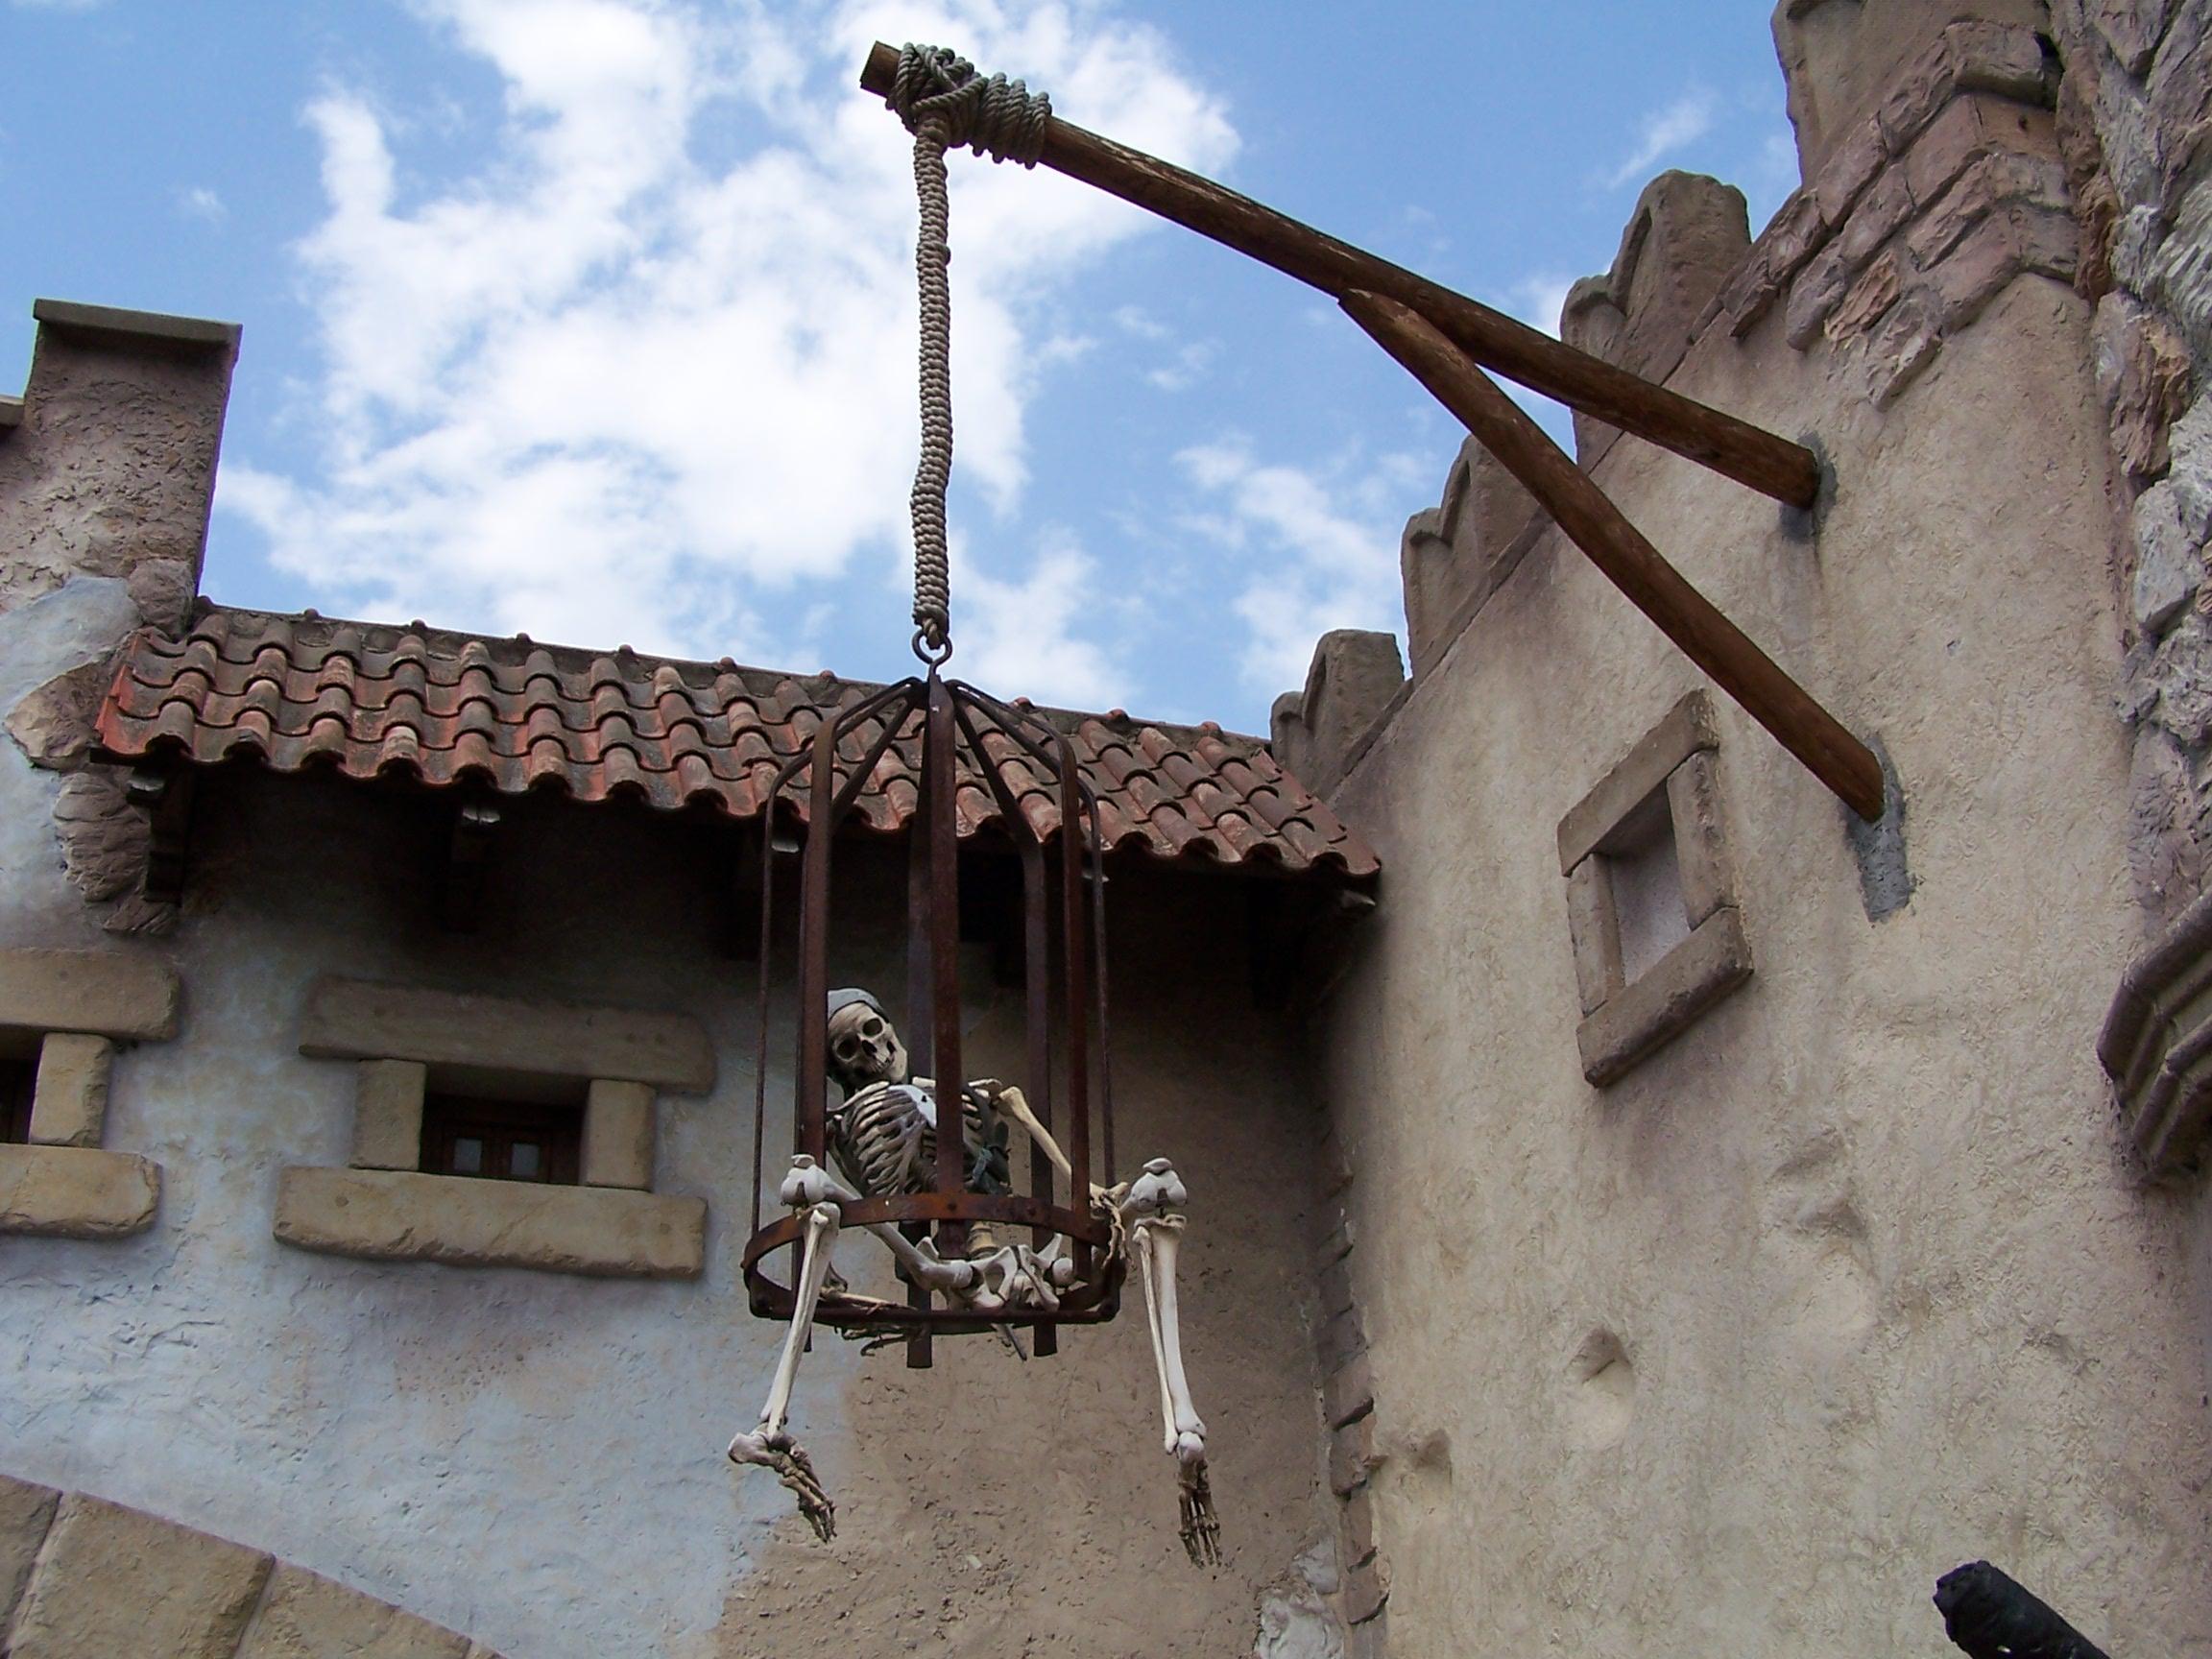 Methods of medieval torture